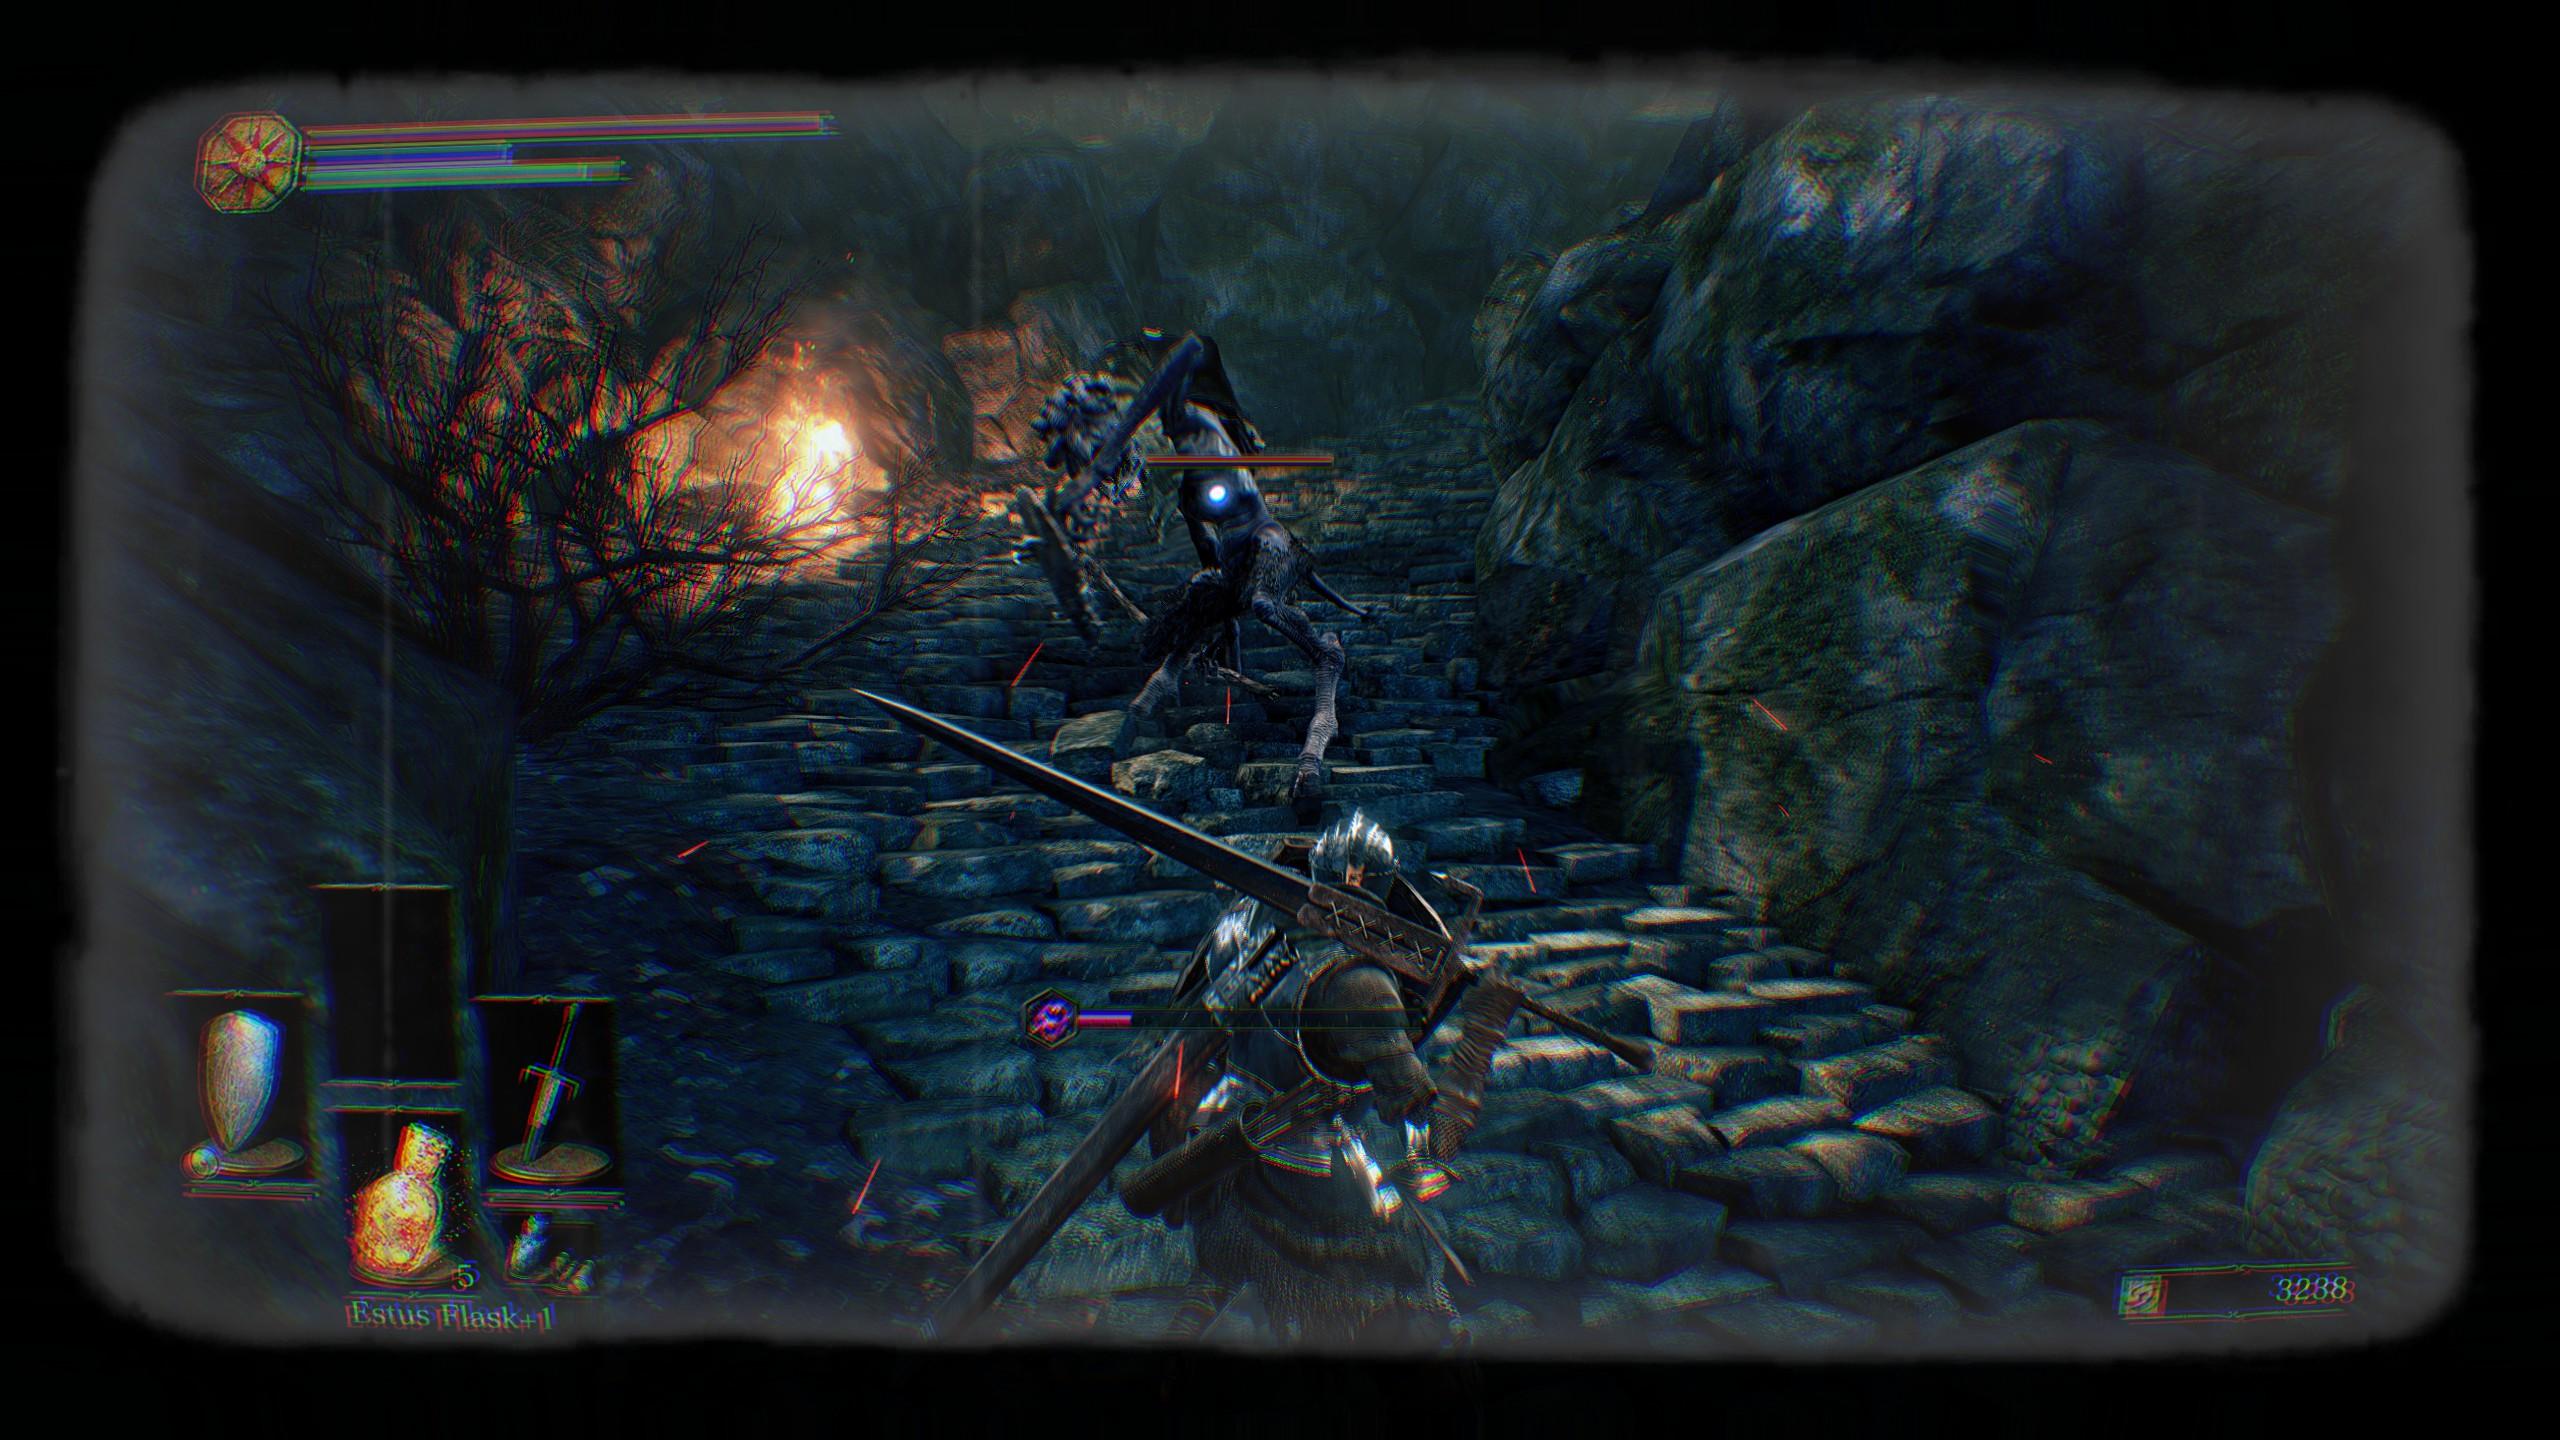 Dark Souls 3 - Page 3 - RealGM